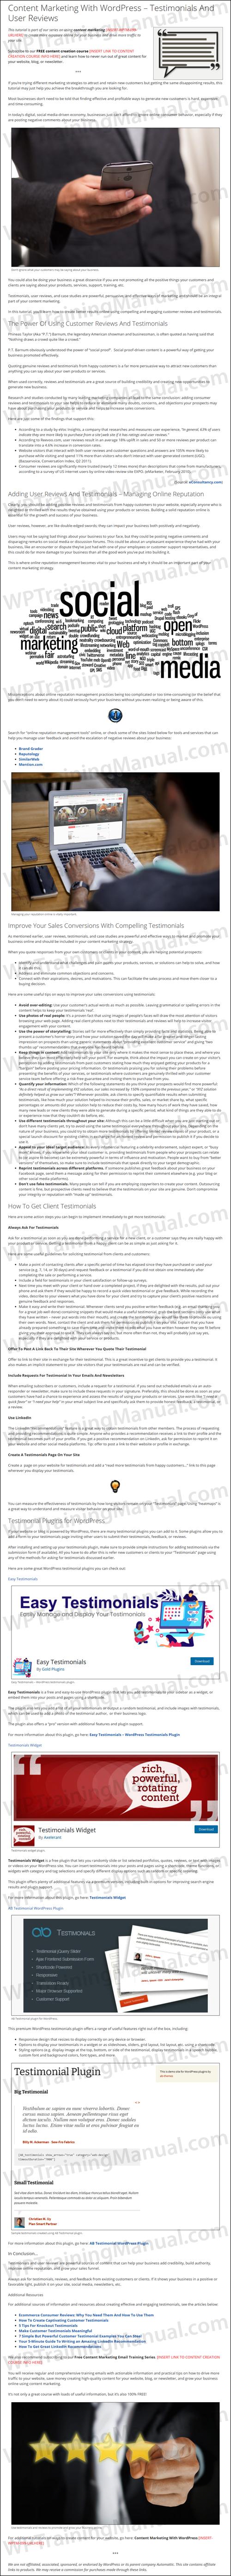 White Label Tutorial: Content Marketing With WordPress - Testimonials And User Reviews - WPTrainingManual.com